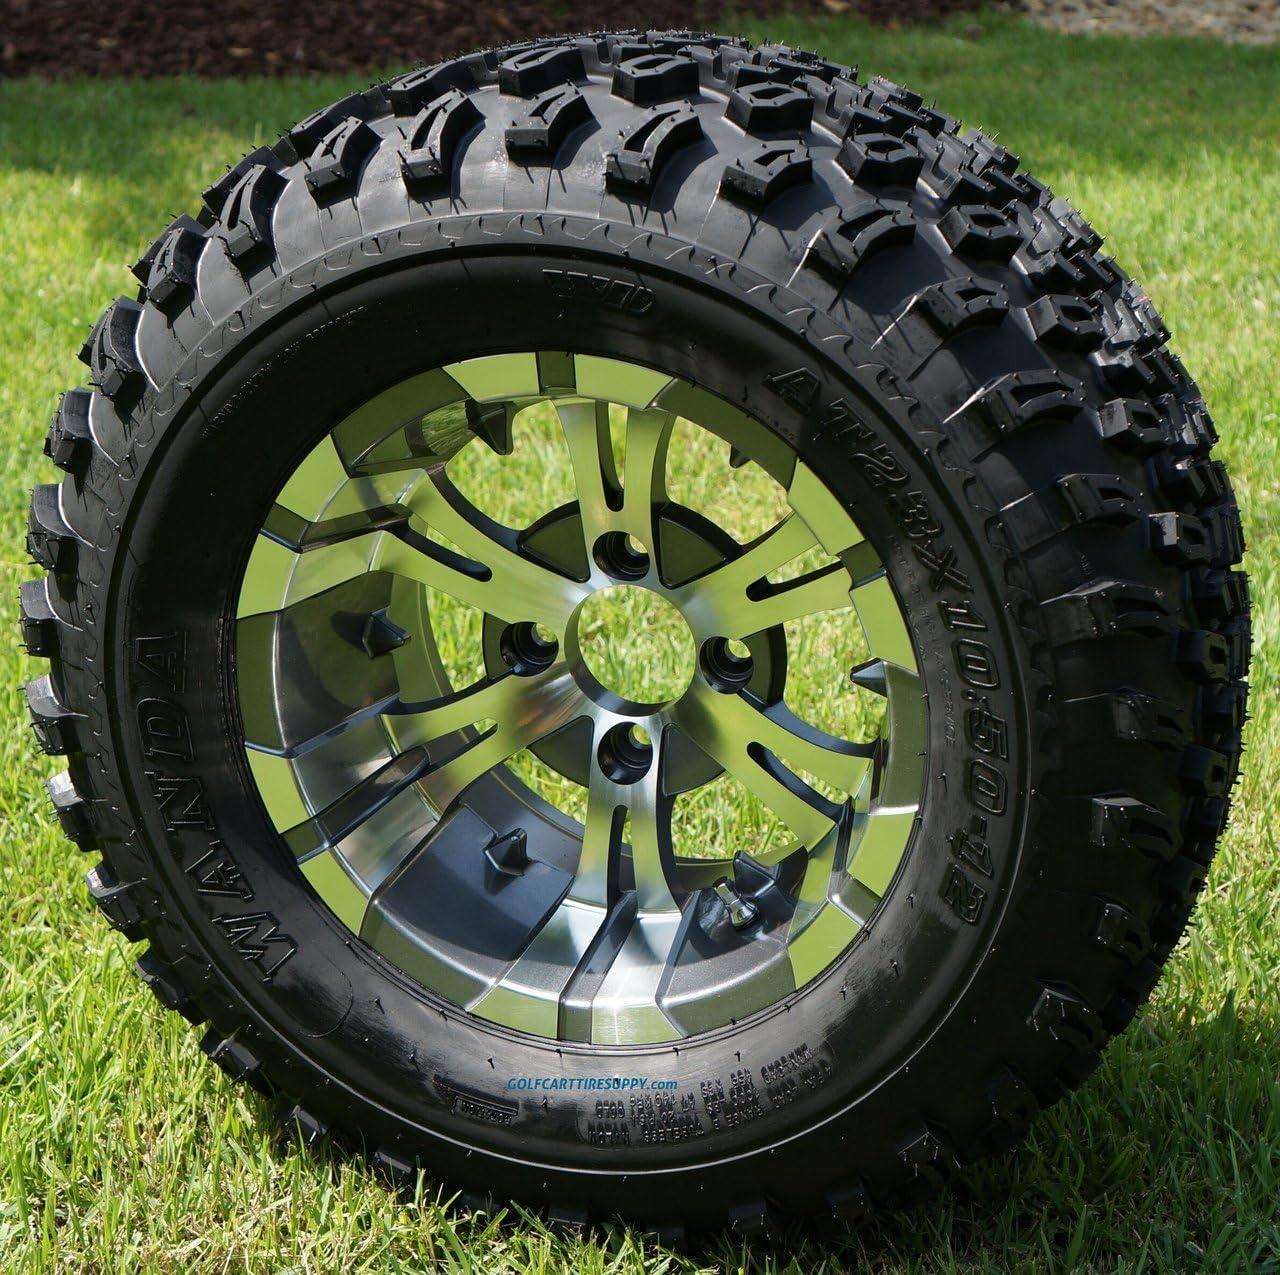 "12"" Vampire Gunmetal Aluminum Wheels and 23X10.5-12"" All Terrain Golf Cart Tires Combo - Set of 4"